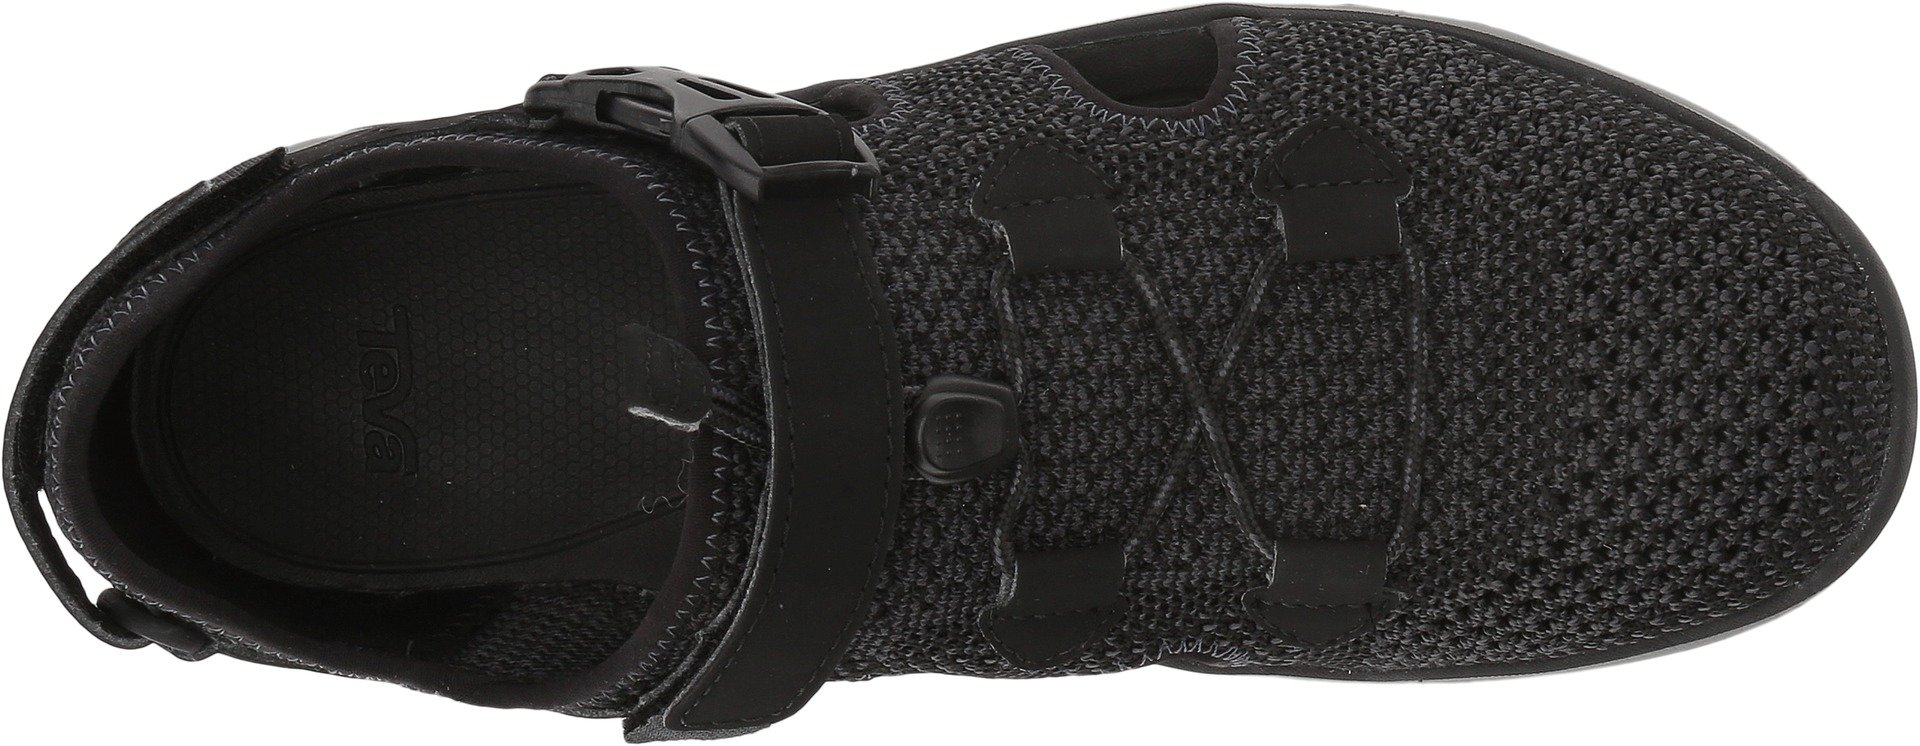 Teva Women's Terra-Float Travel Knit Black 9 B US by Teva (Image #2)